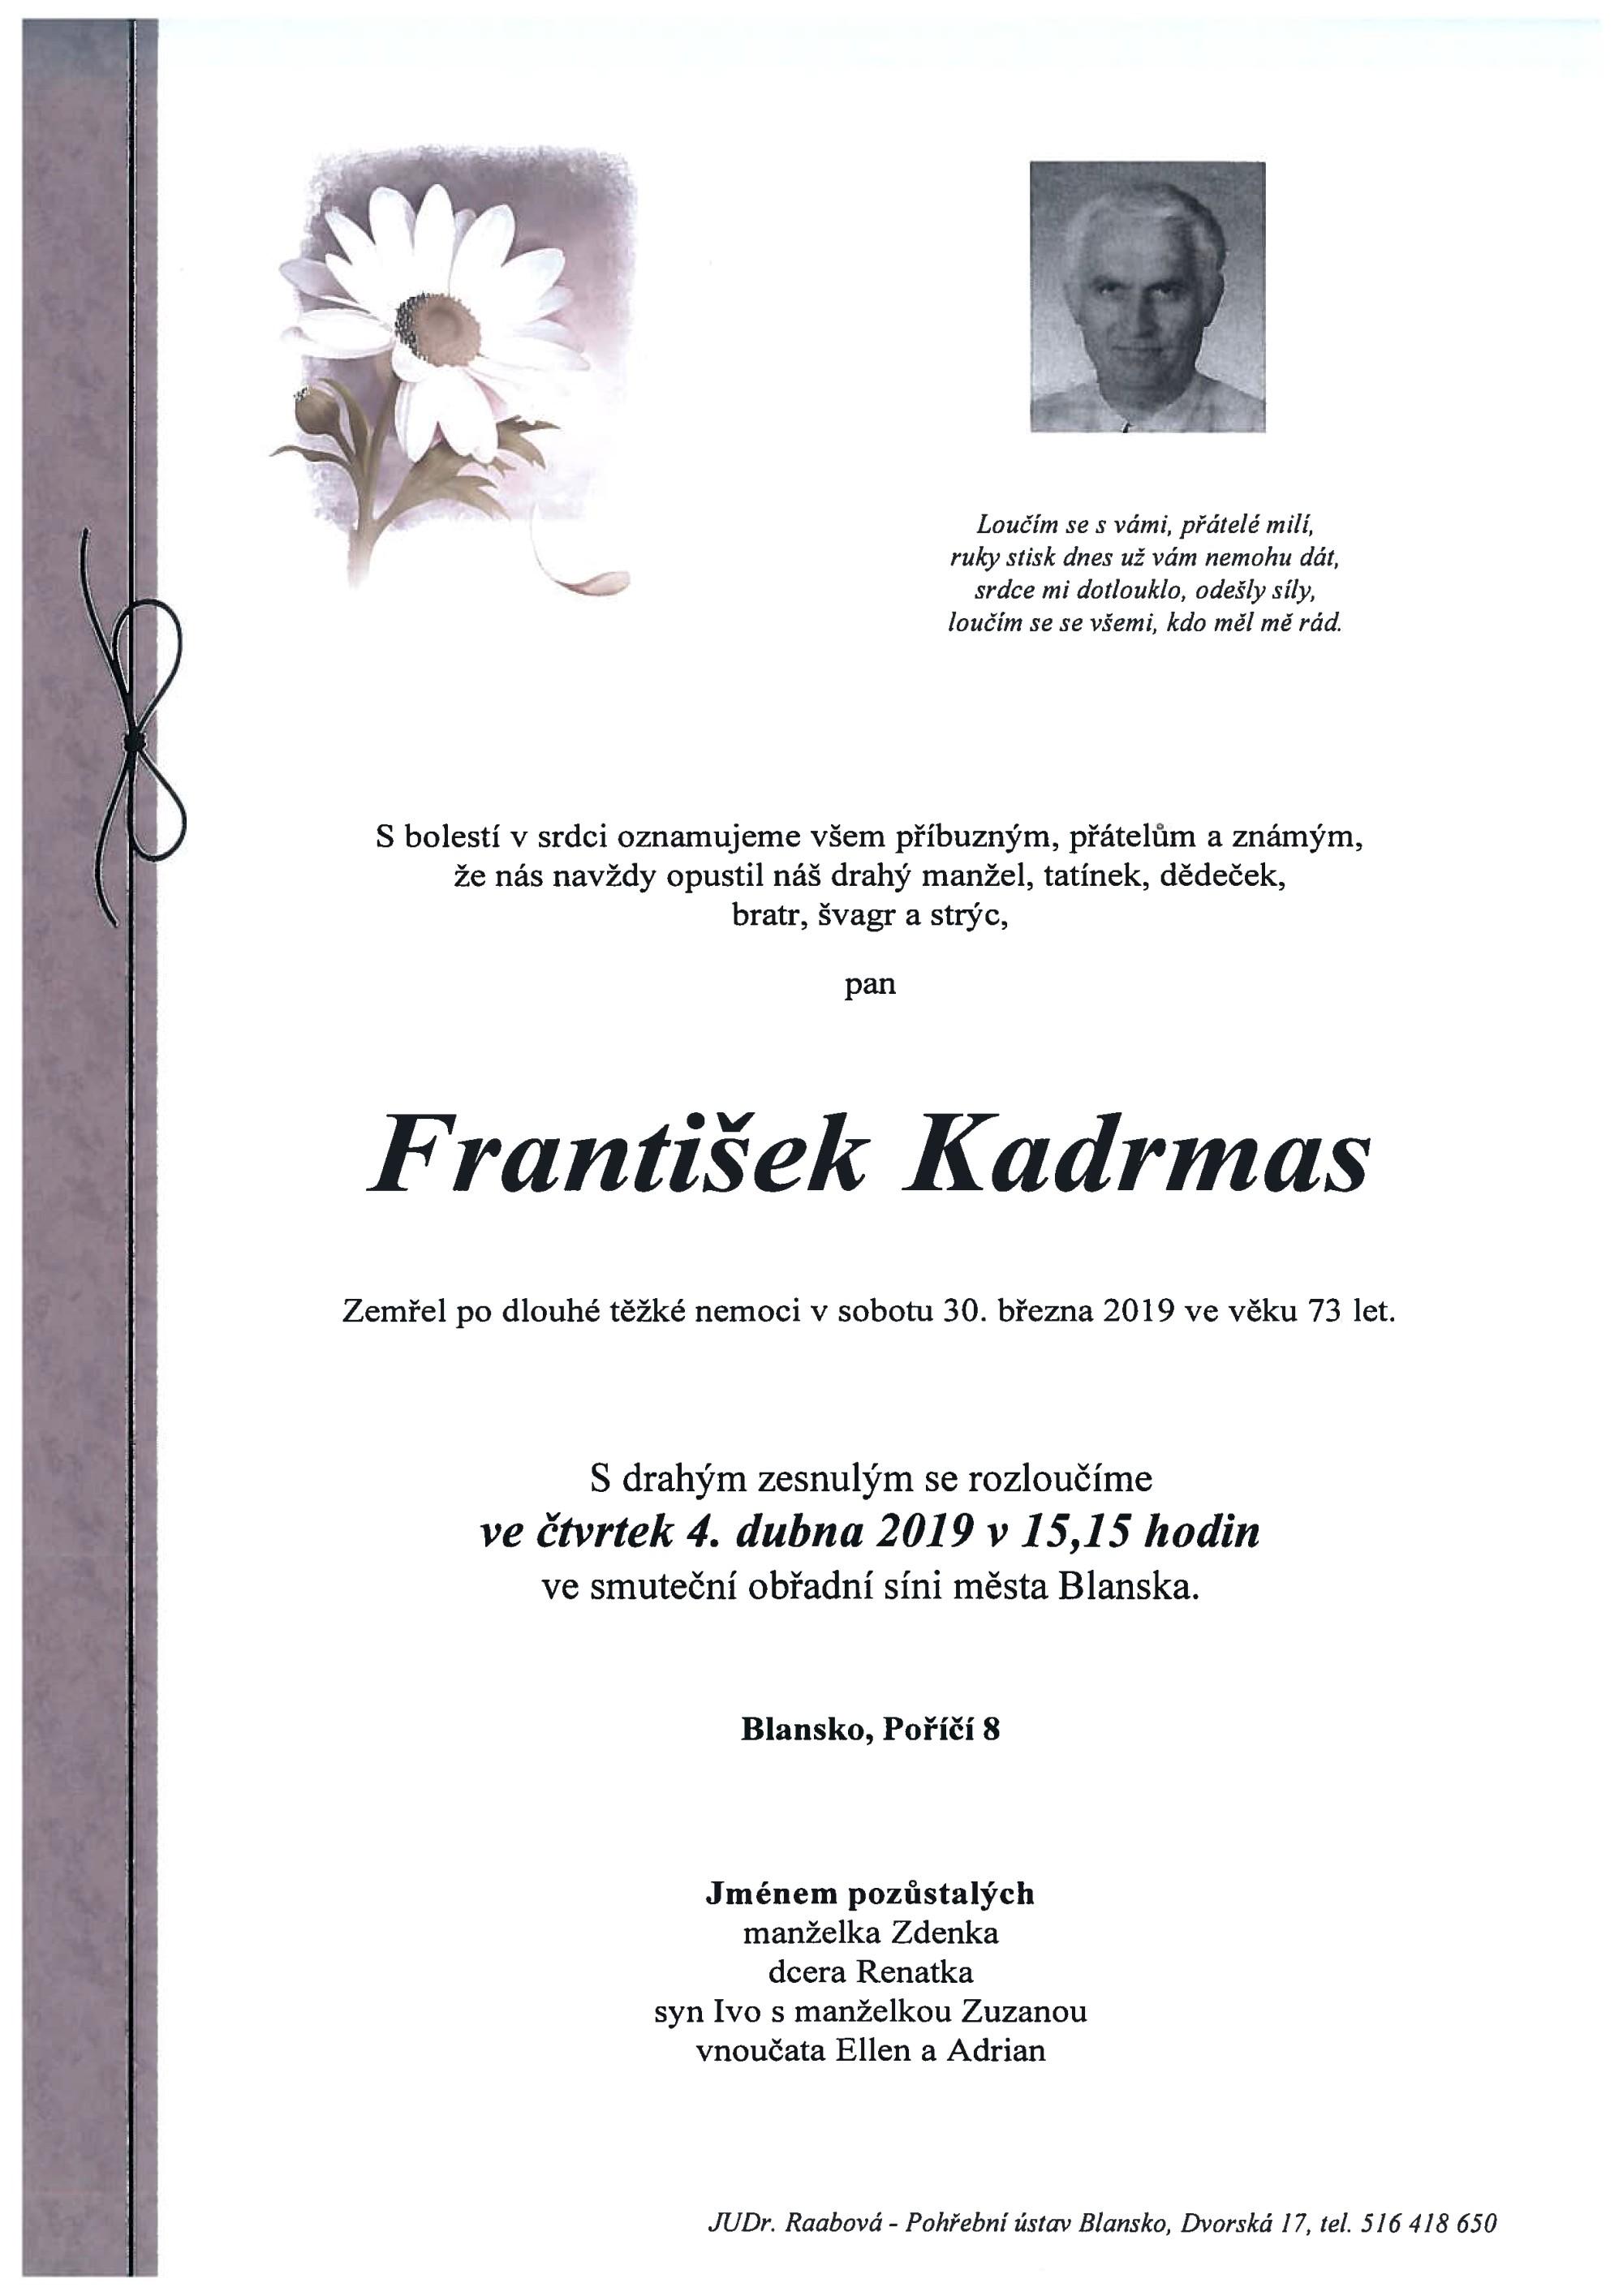 František Kadrmas